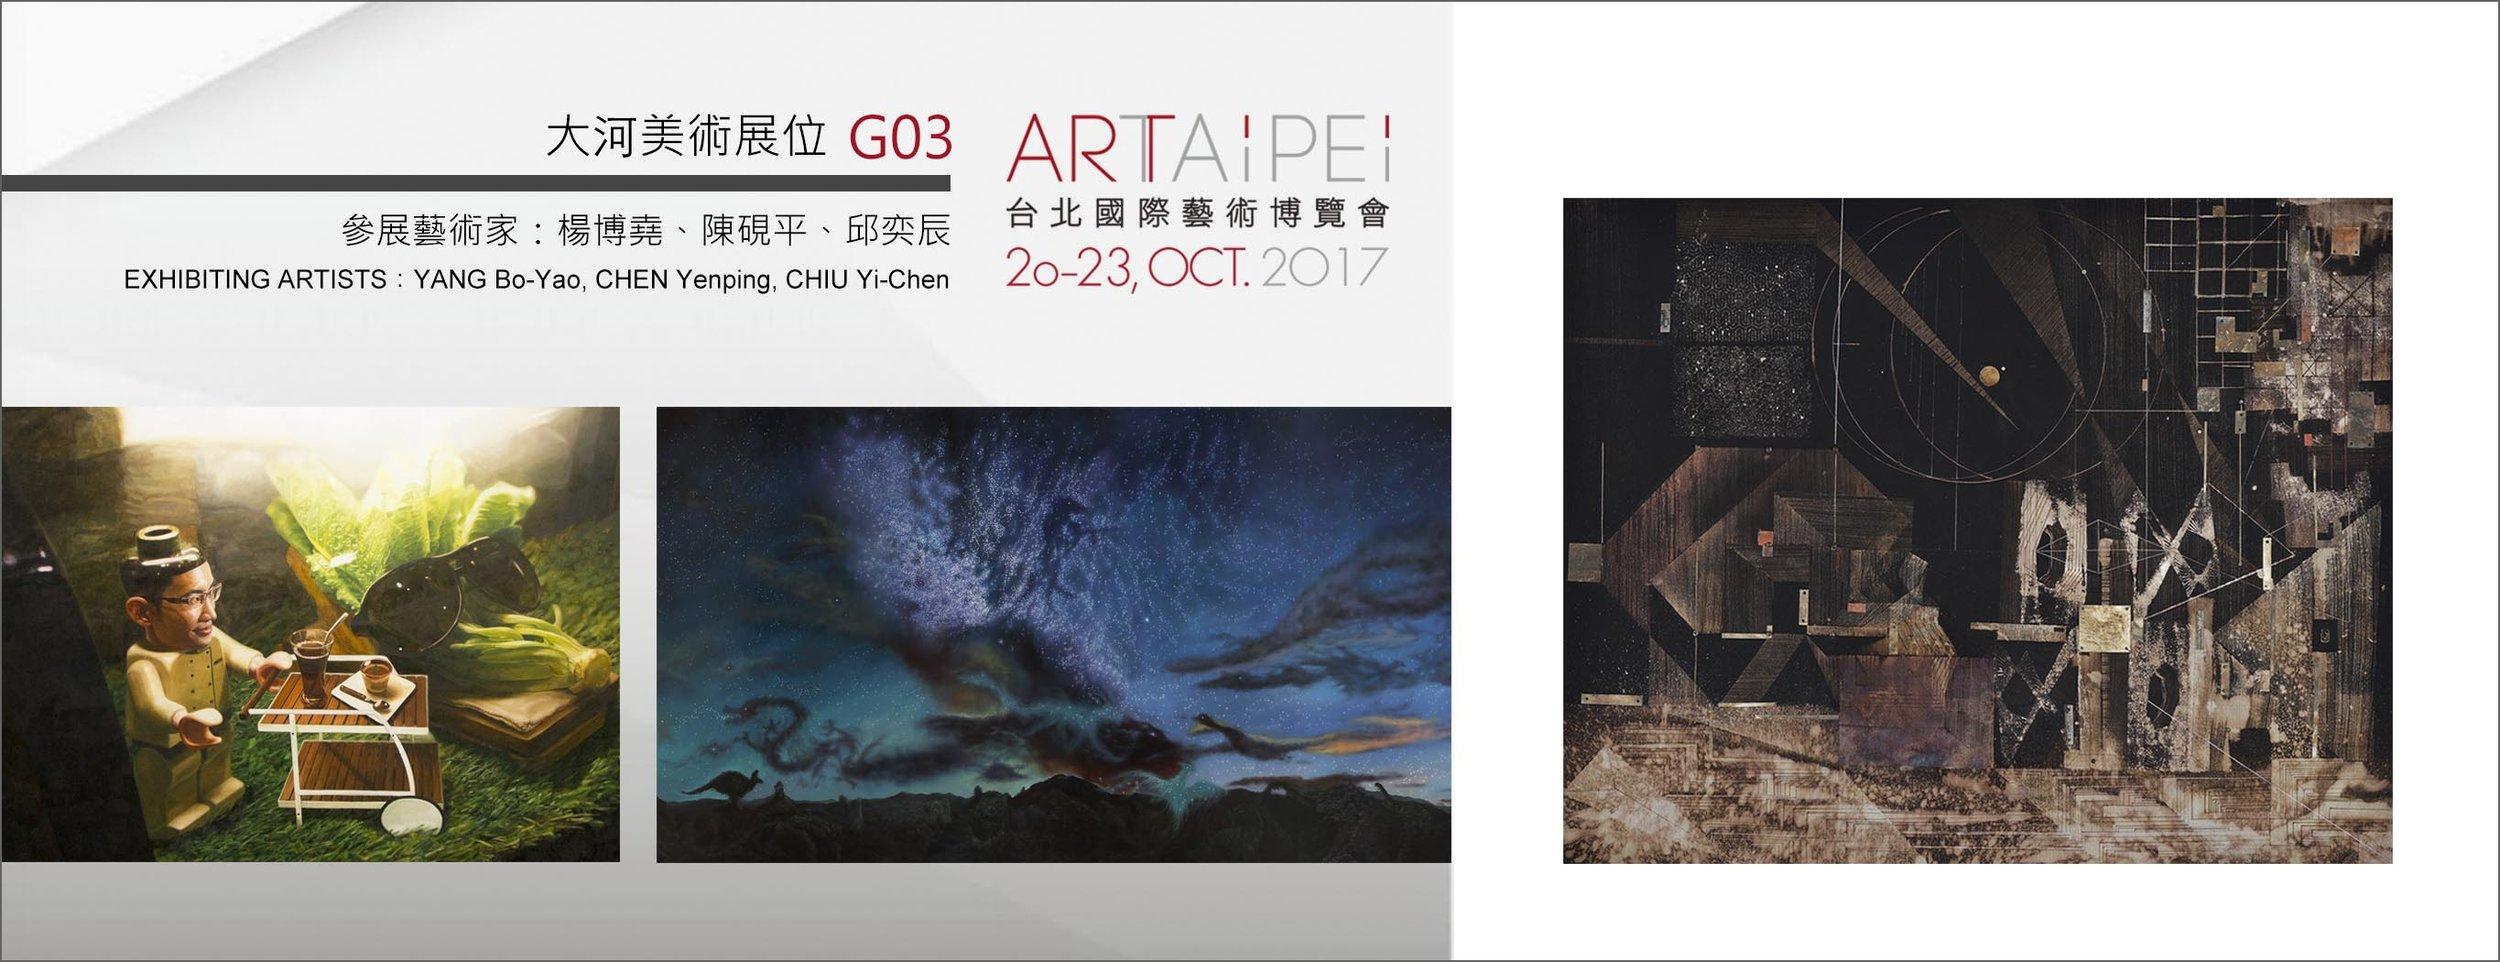 2017 ART TAIPEI_網站首頁.jpg